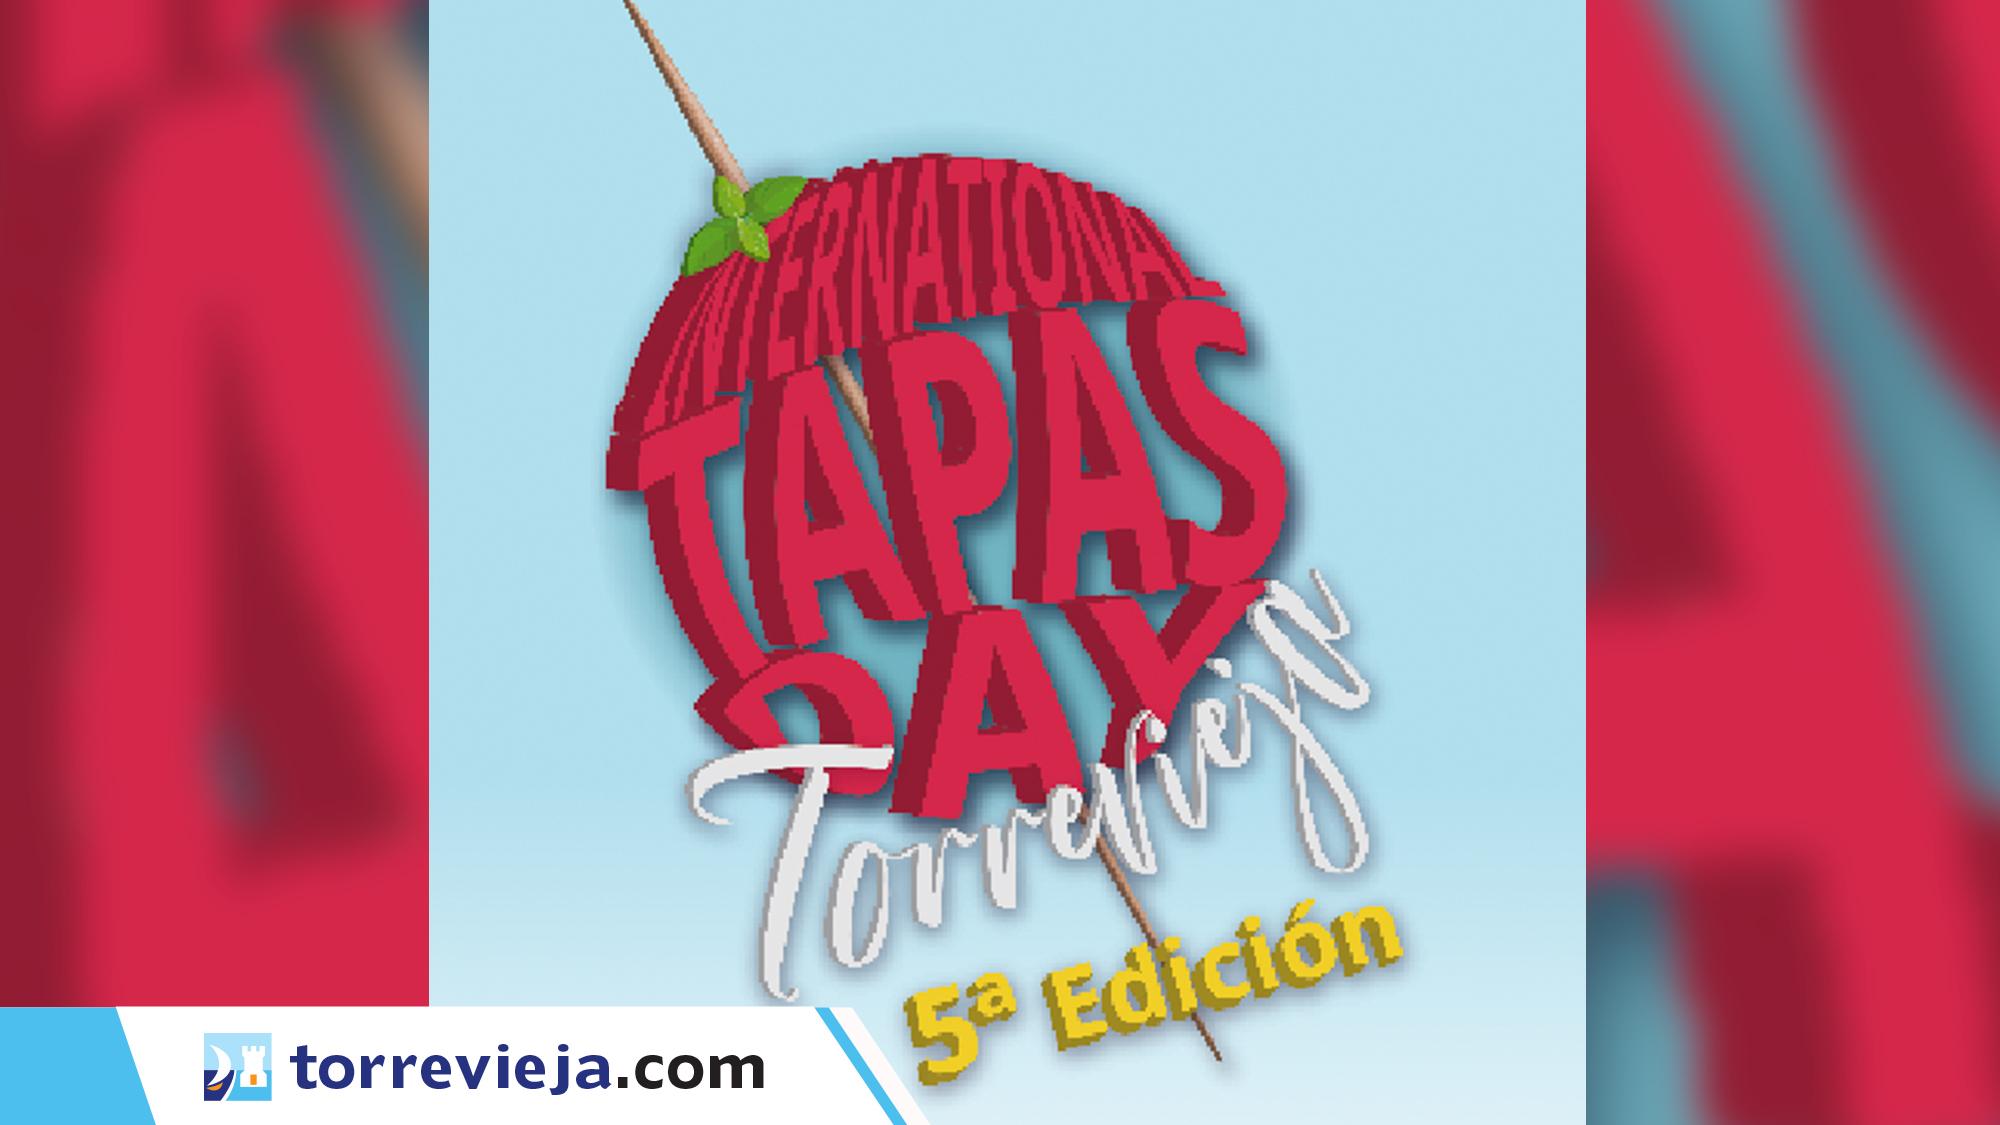 https://torrevieja.com/ps15/wp-content/uploads/2021/04/International-Tapas-day-Torrevieja-2021-septiembre.jpg